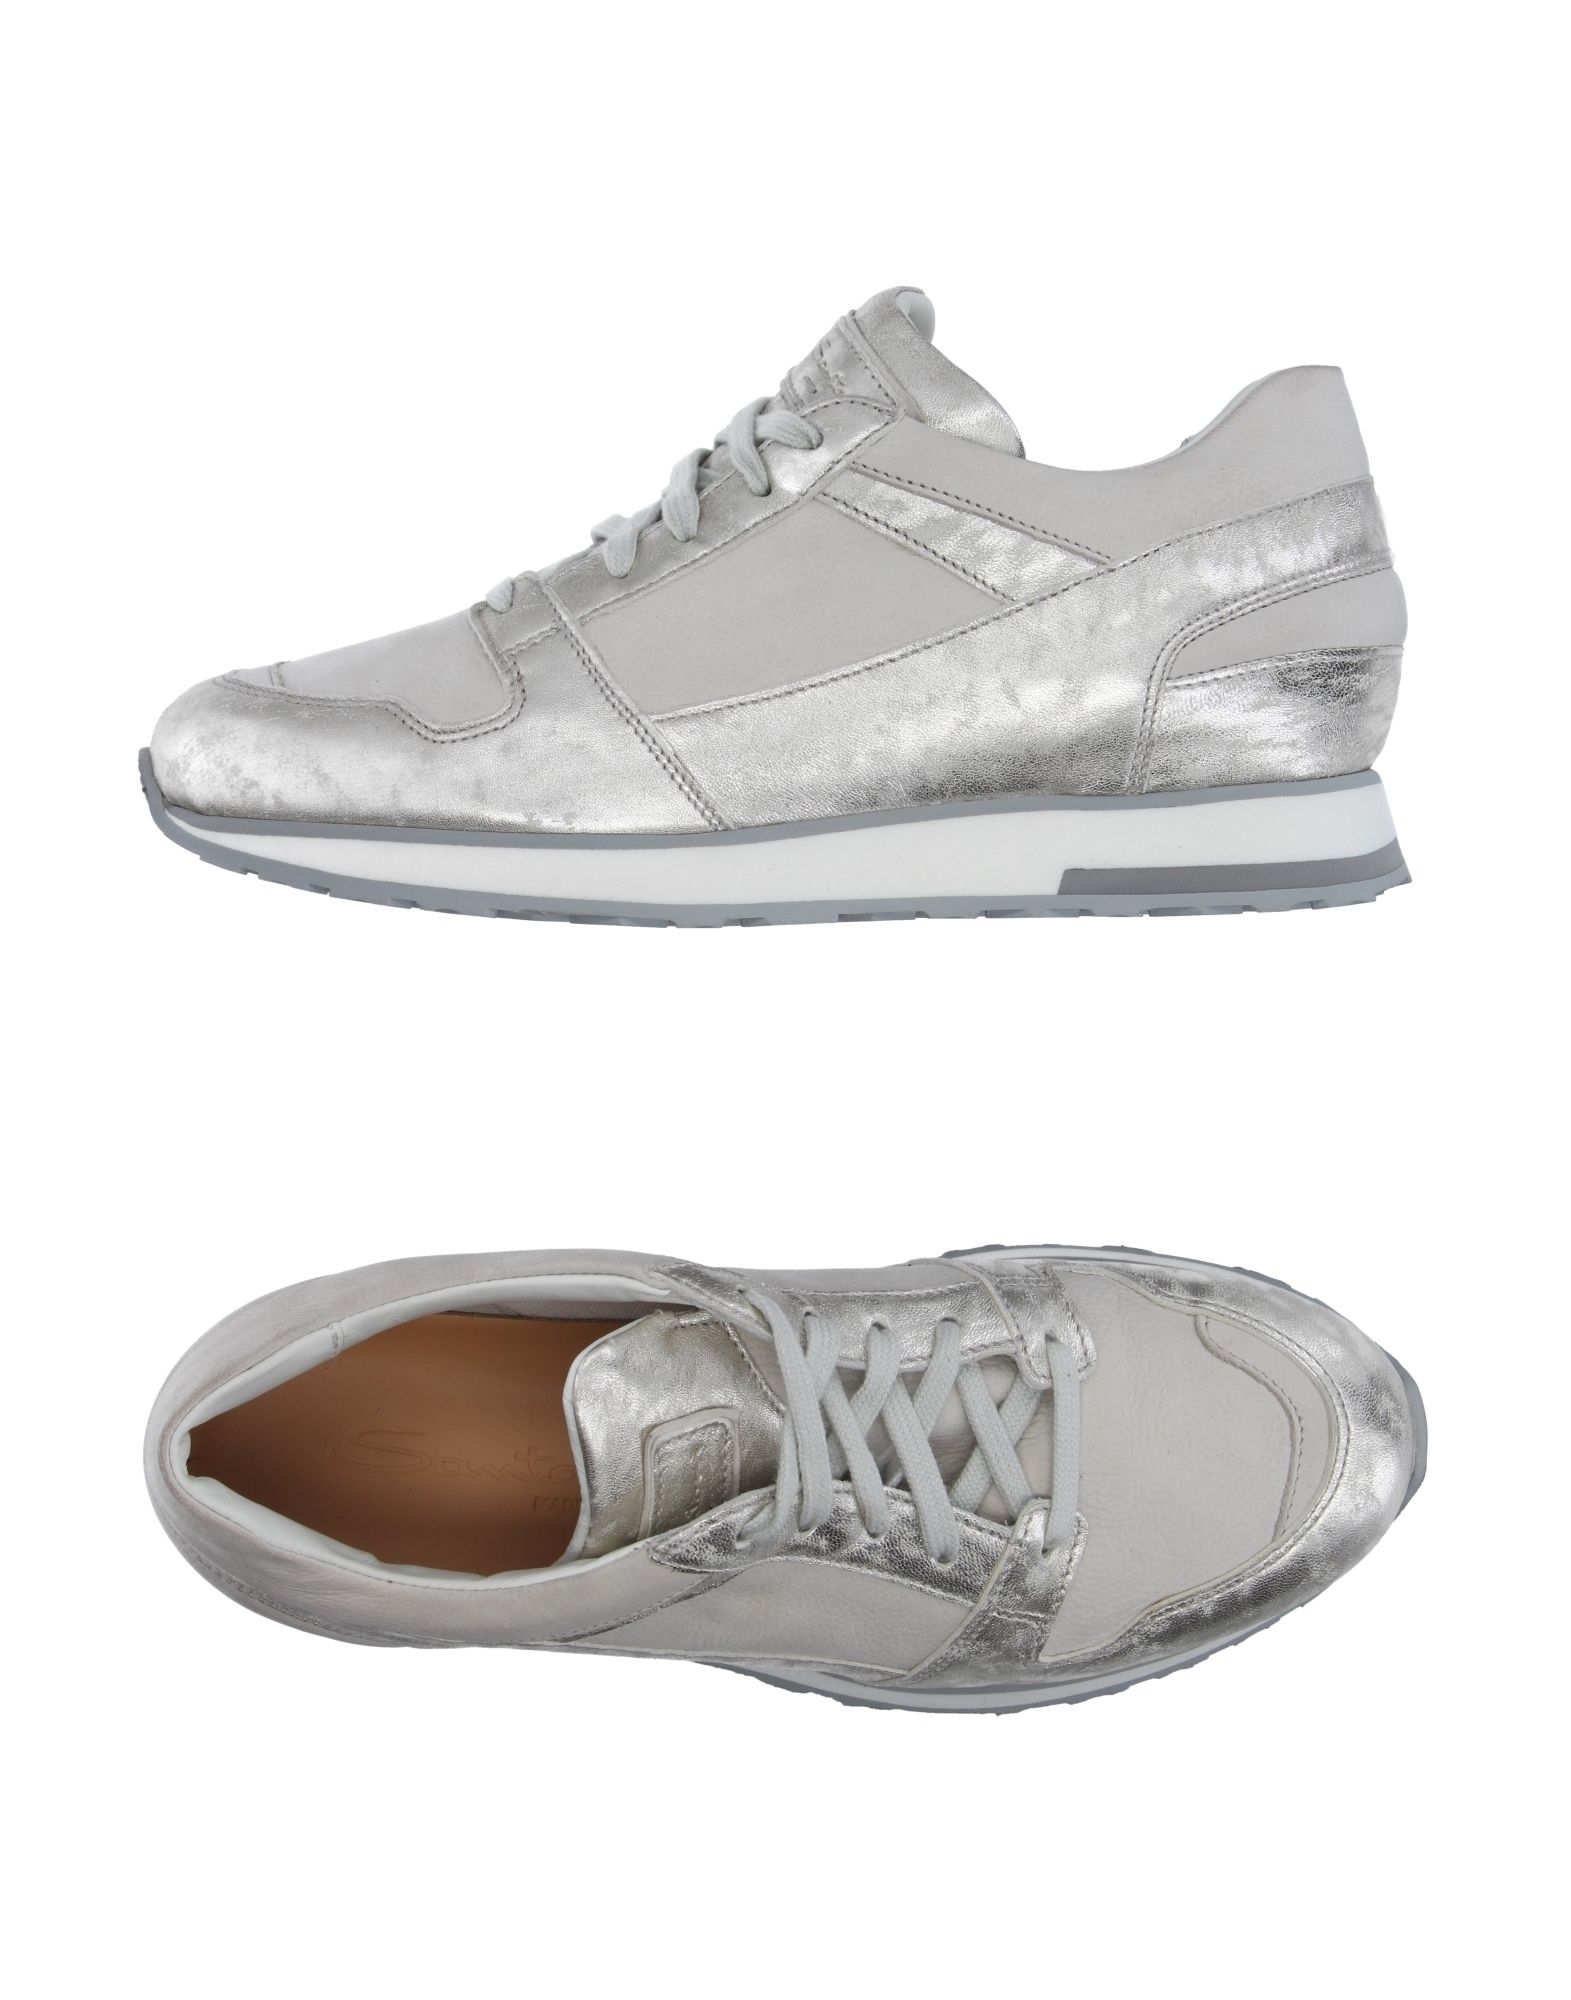 Santoni Sneakers  Damen  Sneakers 11181272DXGut aussehende strapazierfähige Schuhe 6853c8